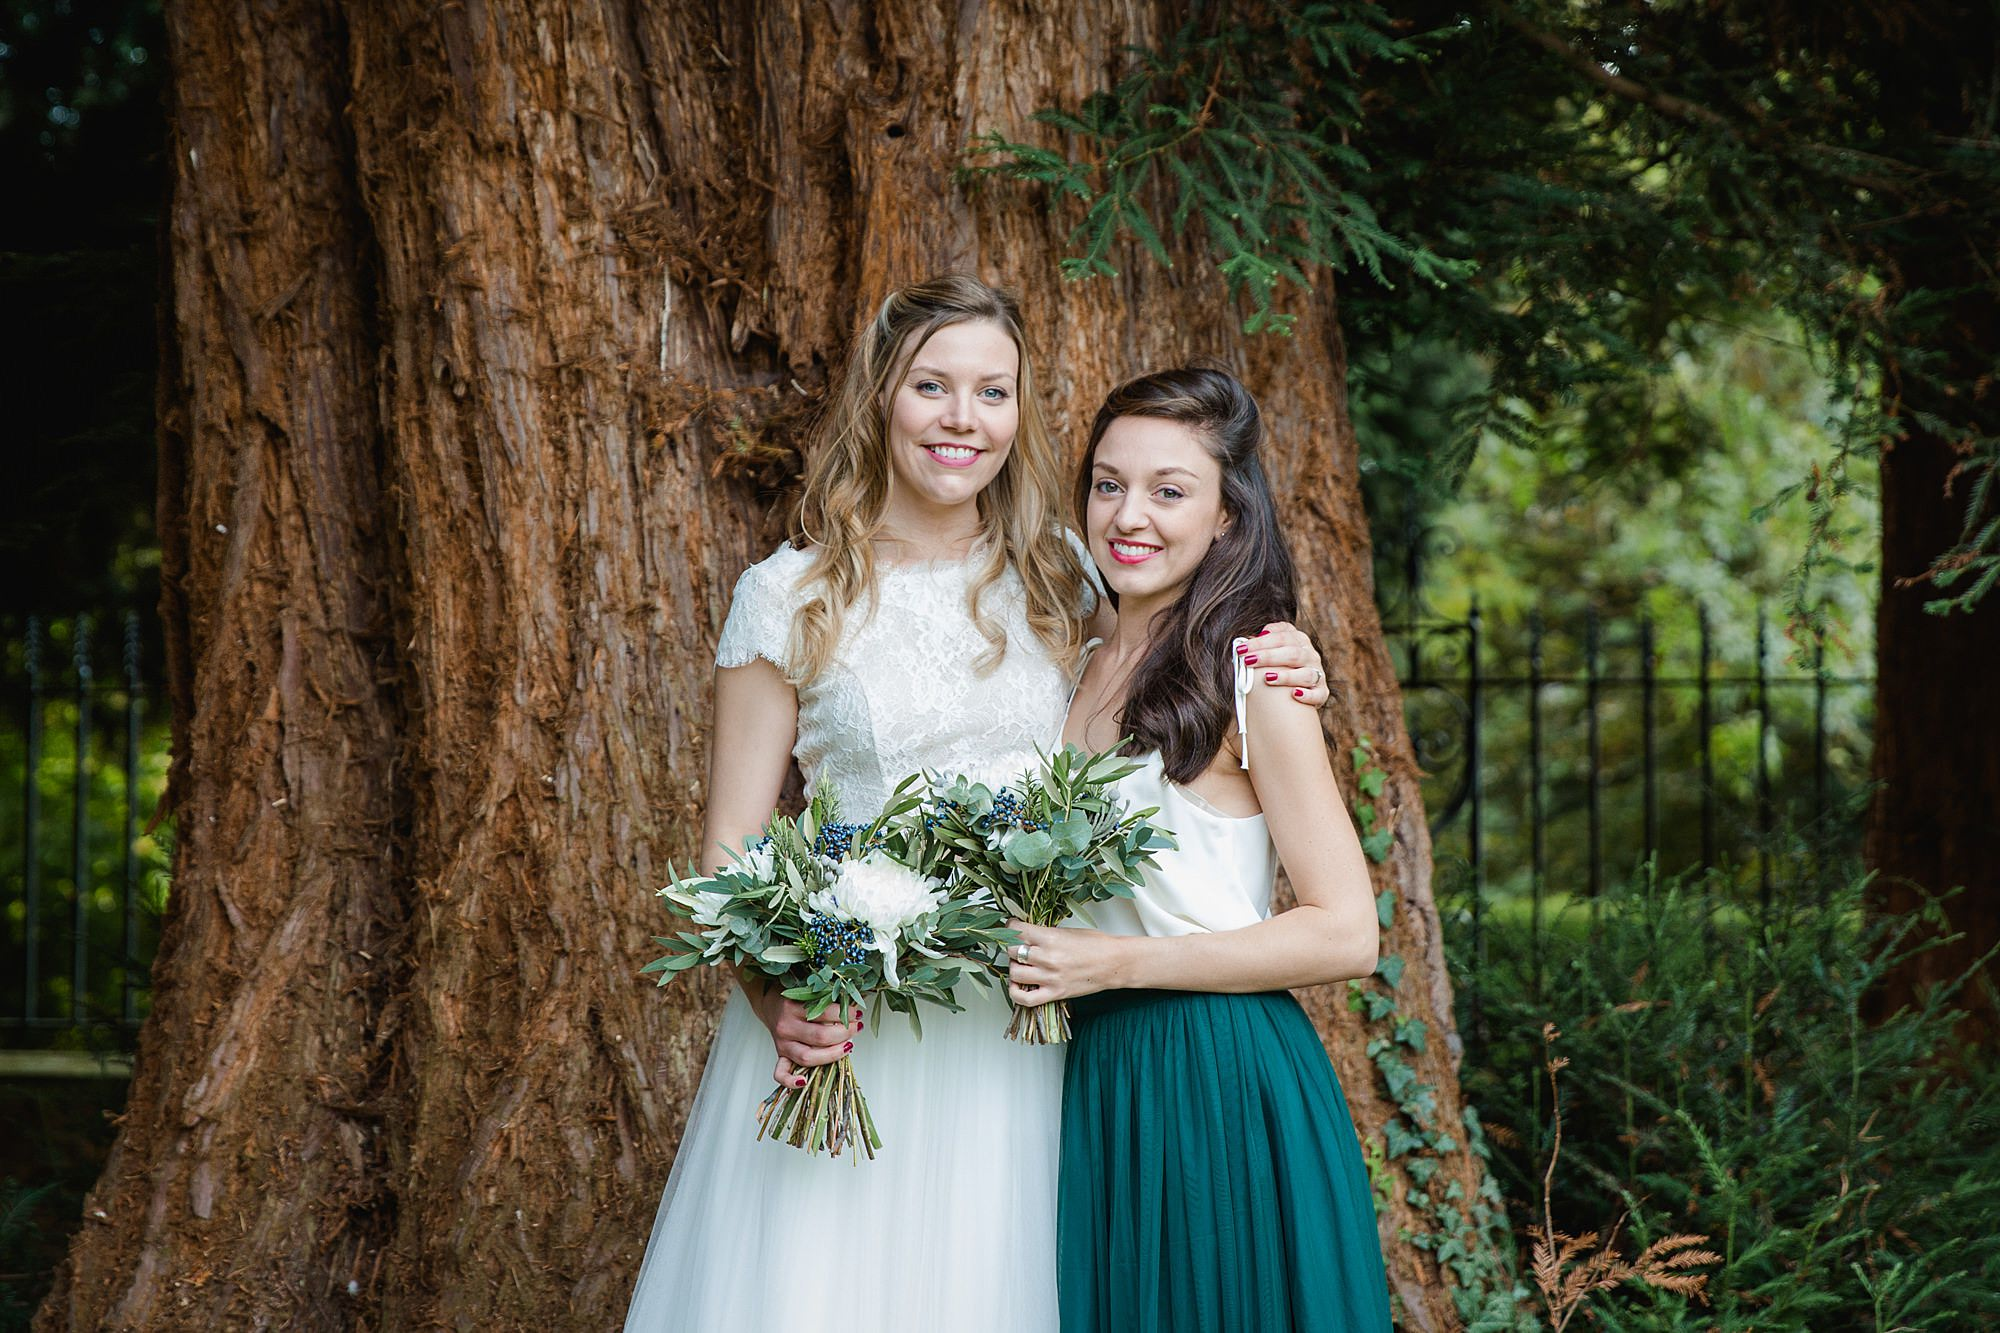 shaw house wedding bride and bridesmaid